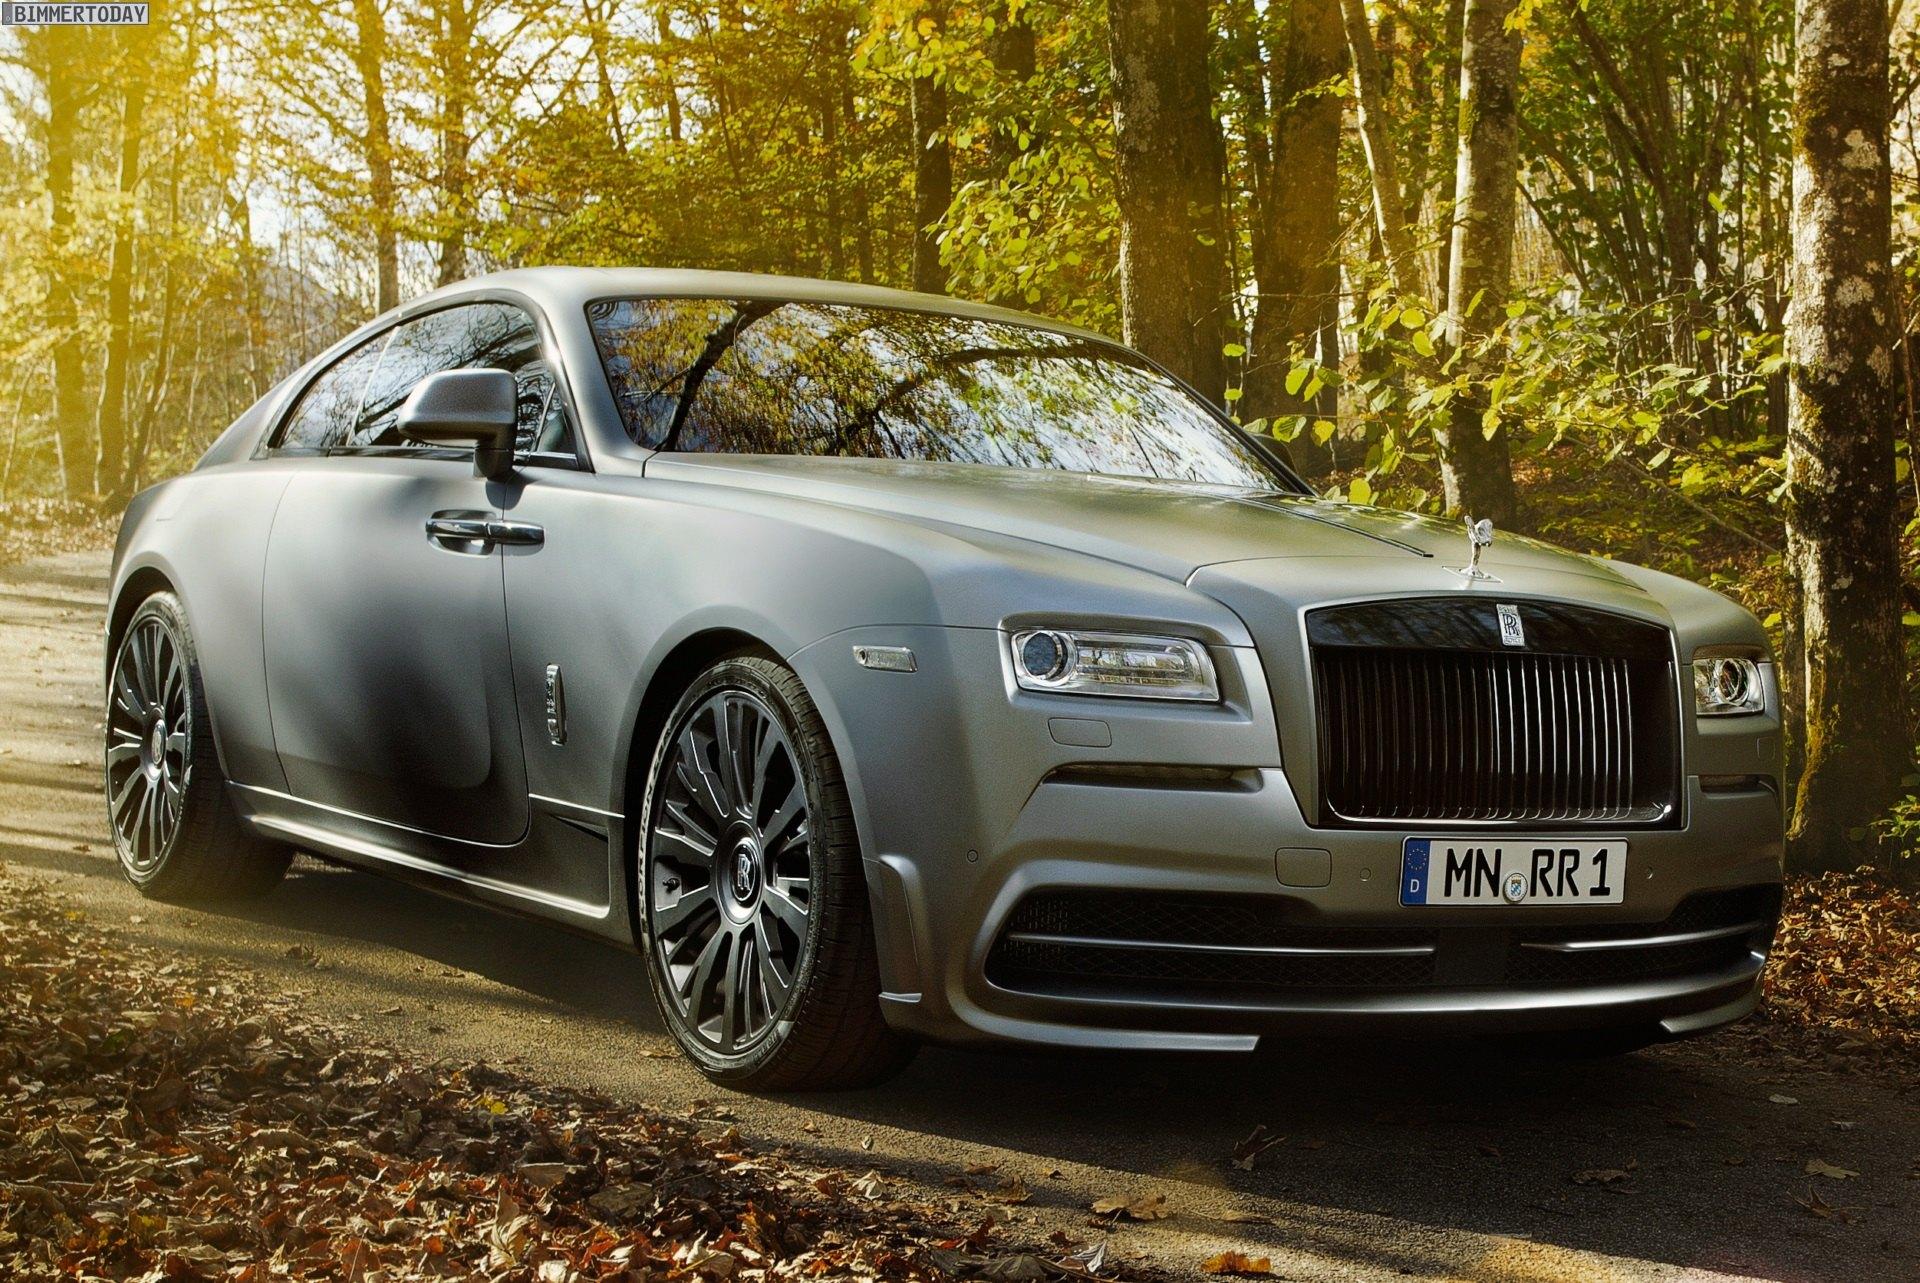 SPOFEC-Rolls-Royce-Wraith-Tuning-717-PS-Luxus-Coupe-09